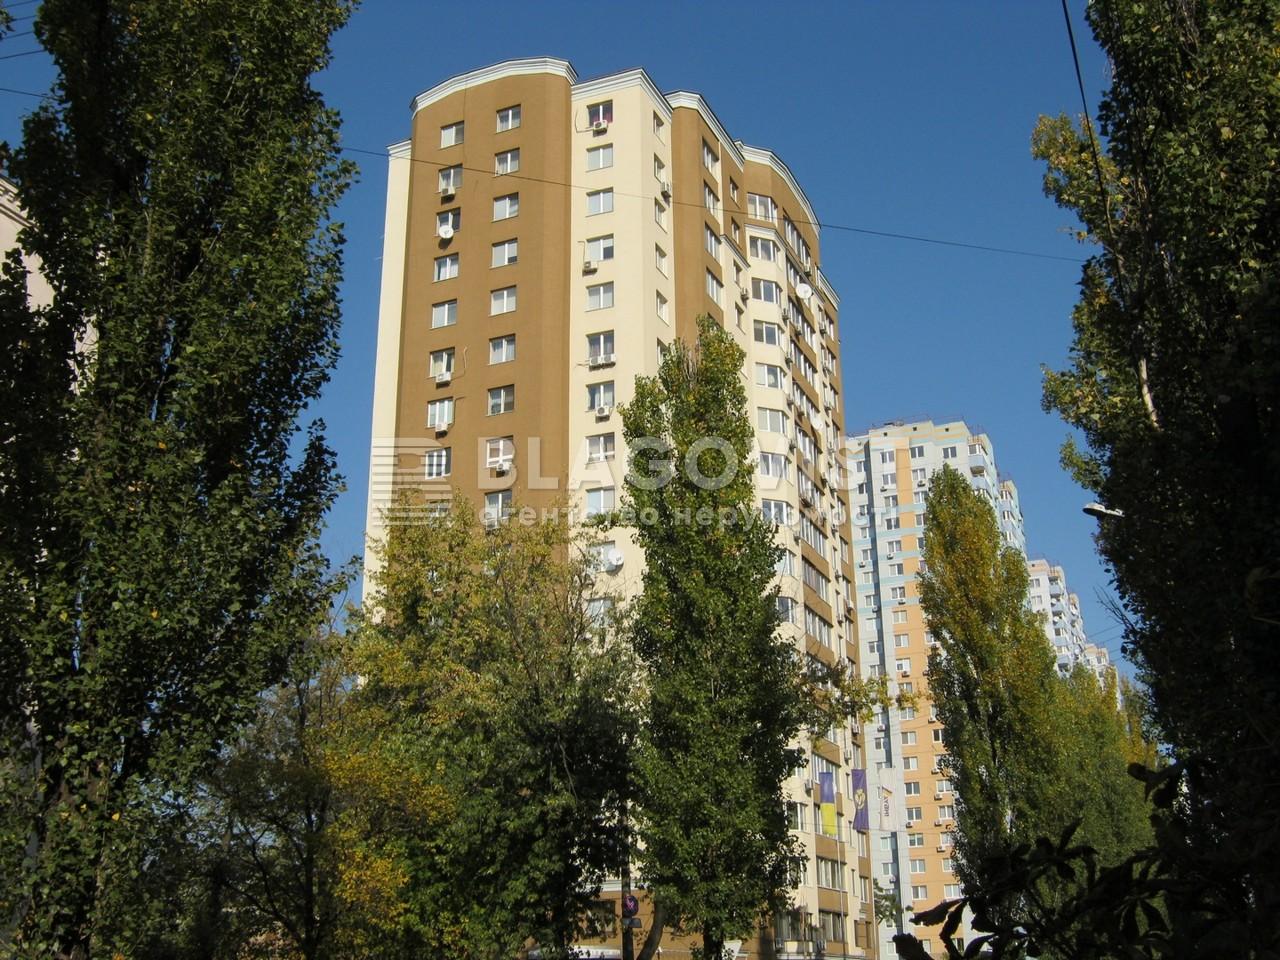 Квартира R-37942, Пожарского, 10/15, Киев - Фото 2